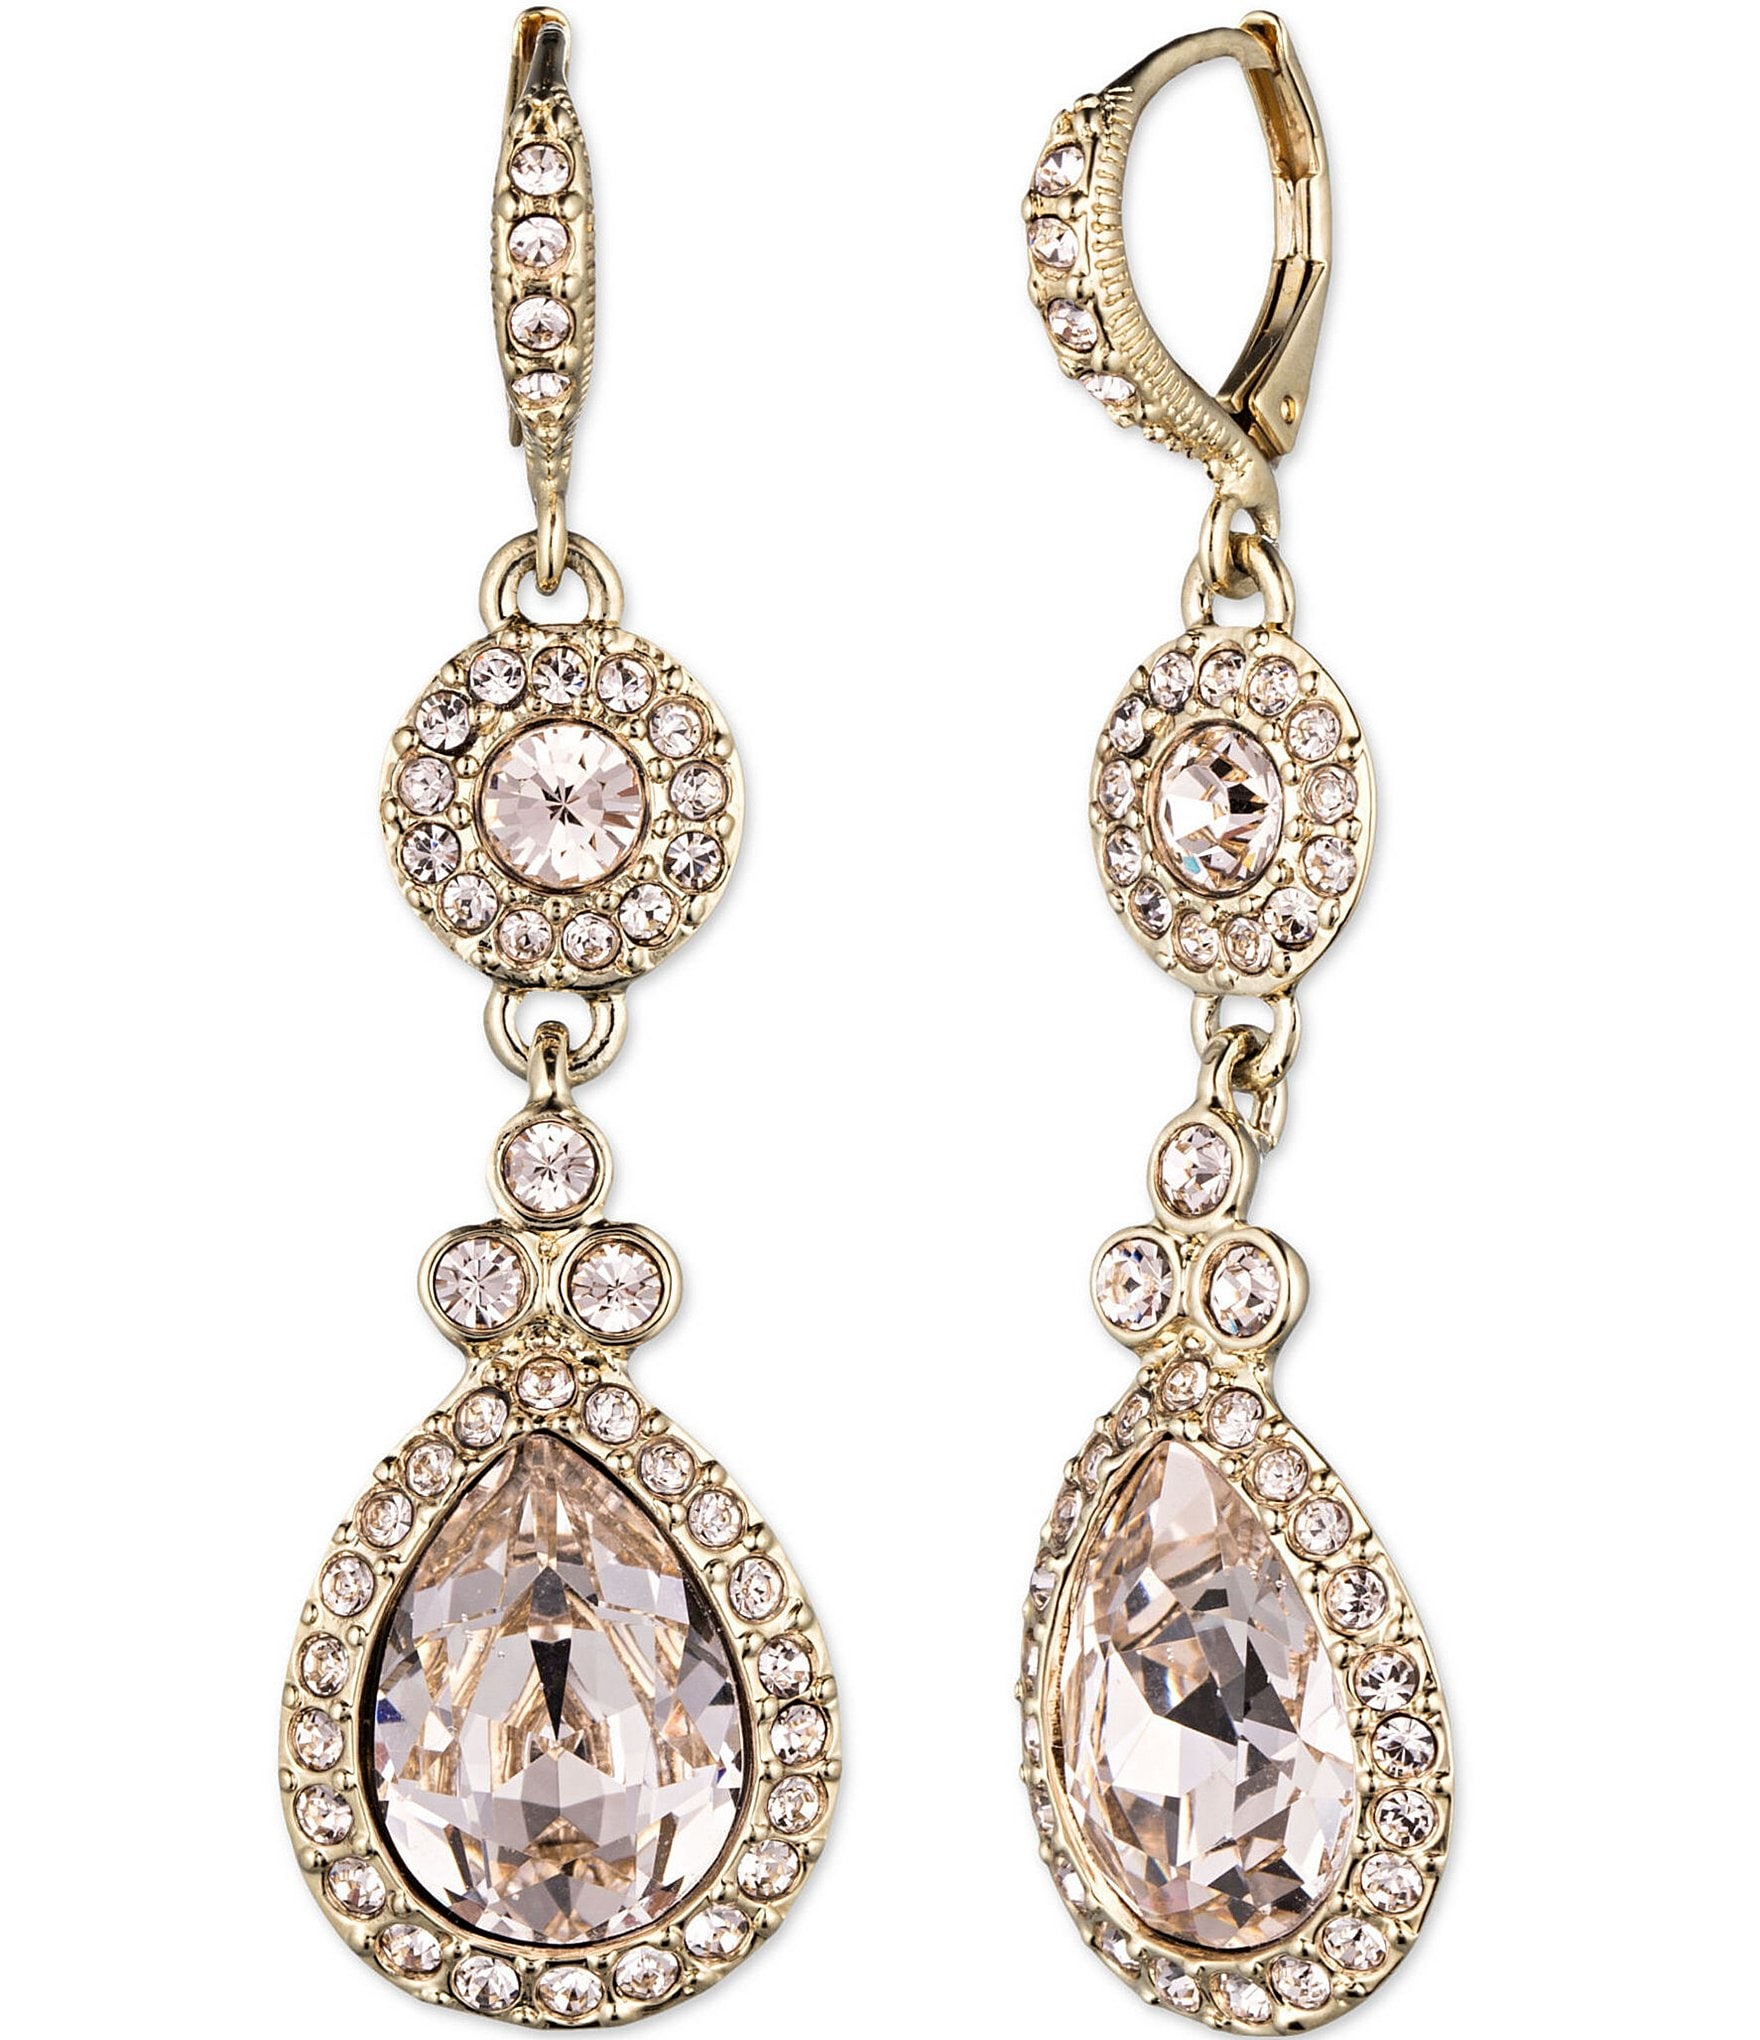 Givenchy Crystal Drop Earrings Dillard S